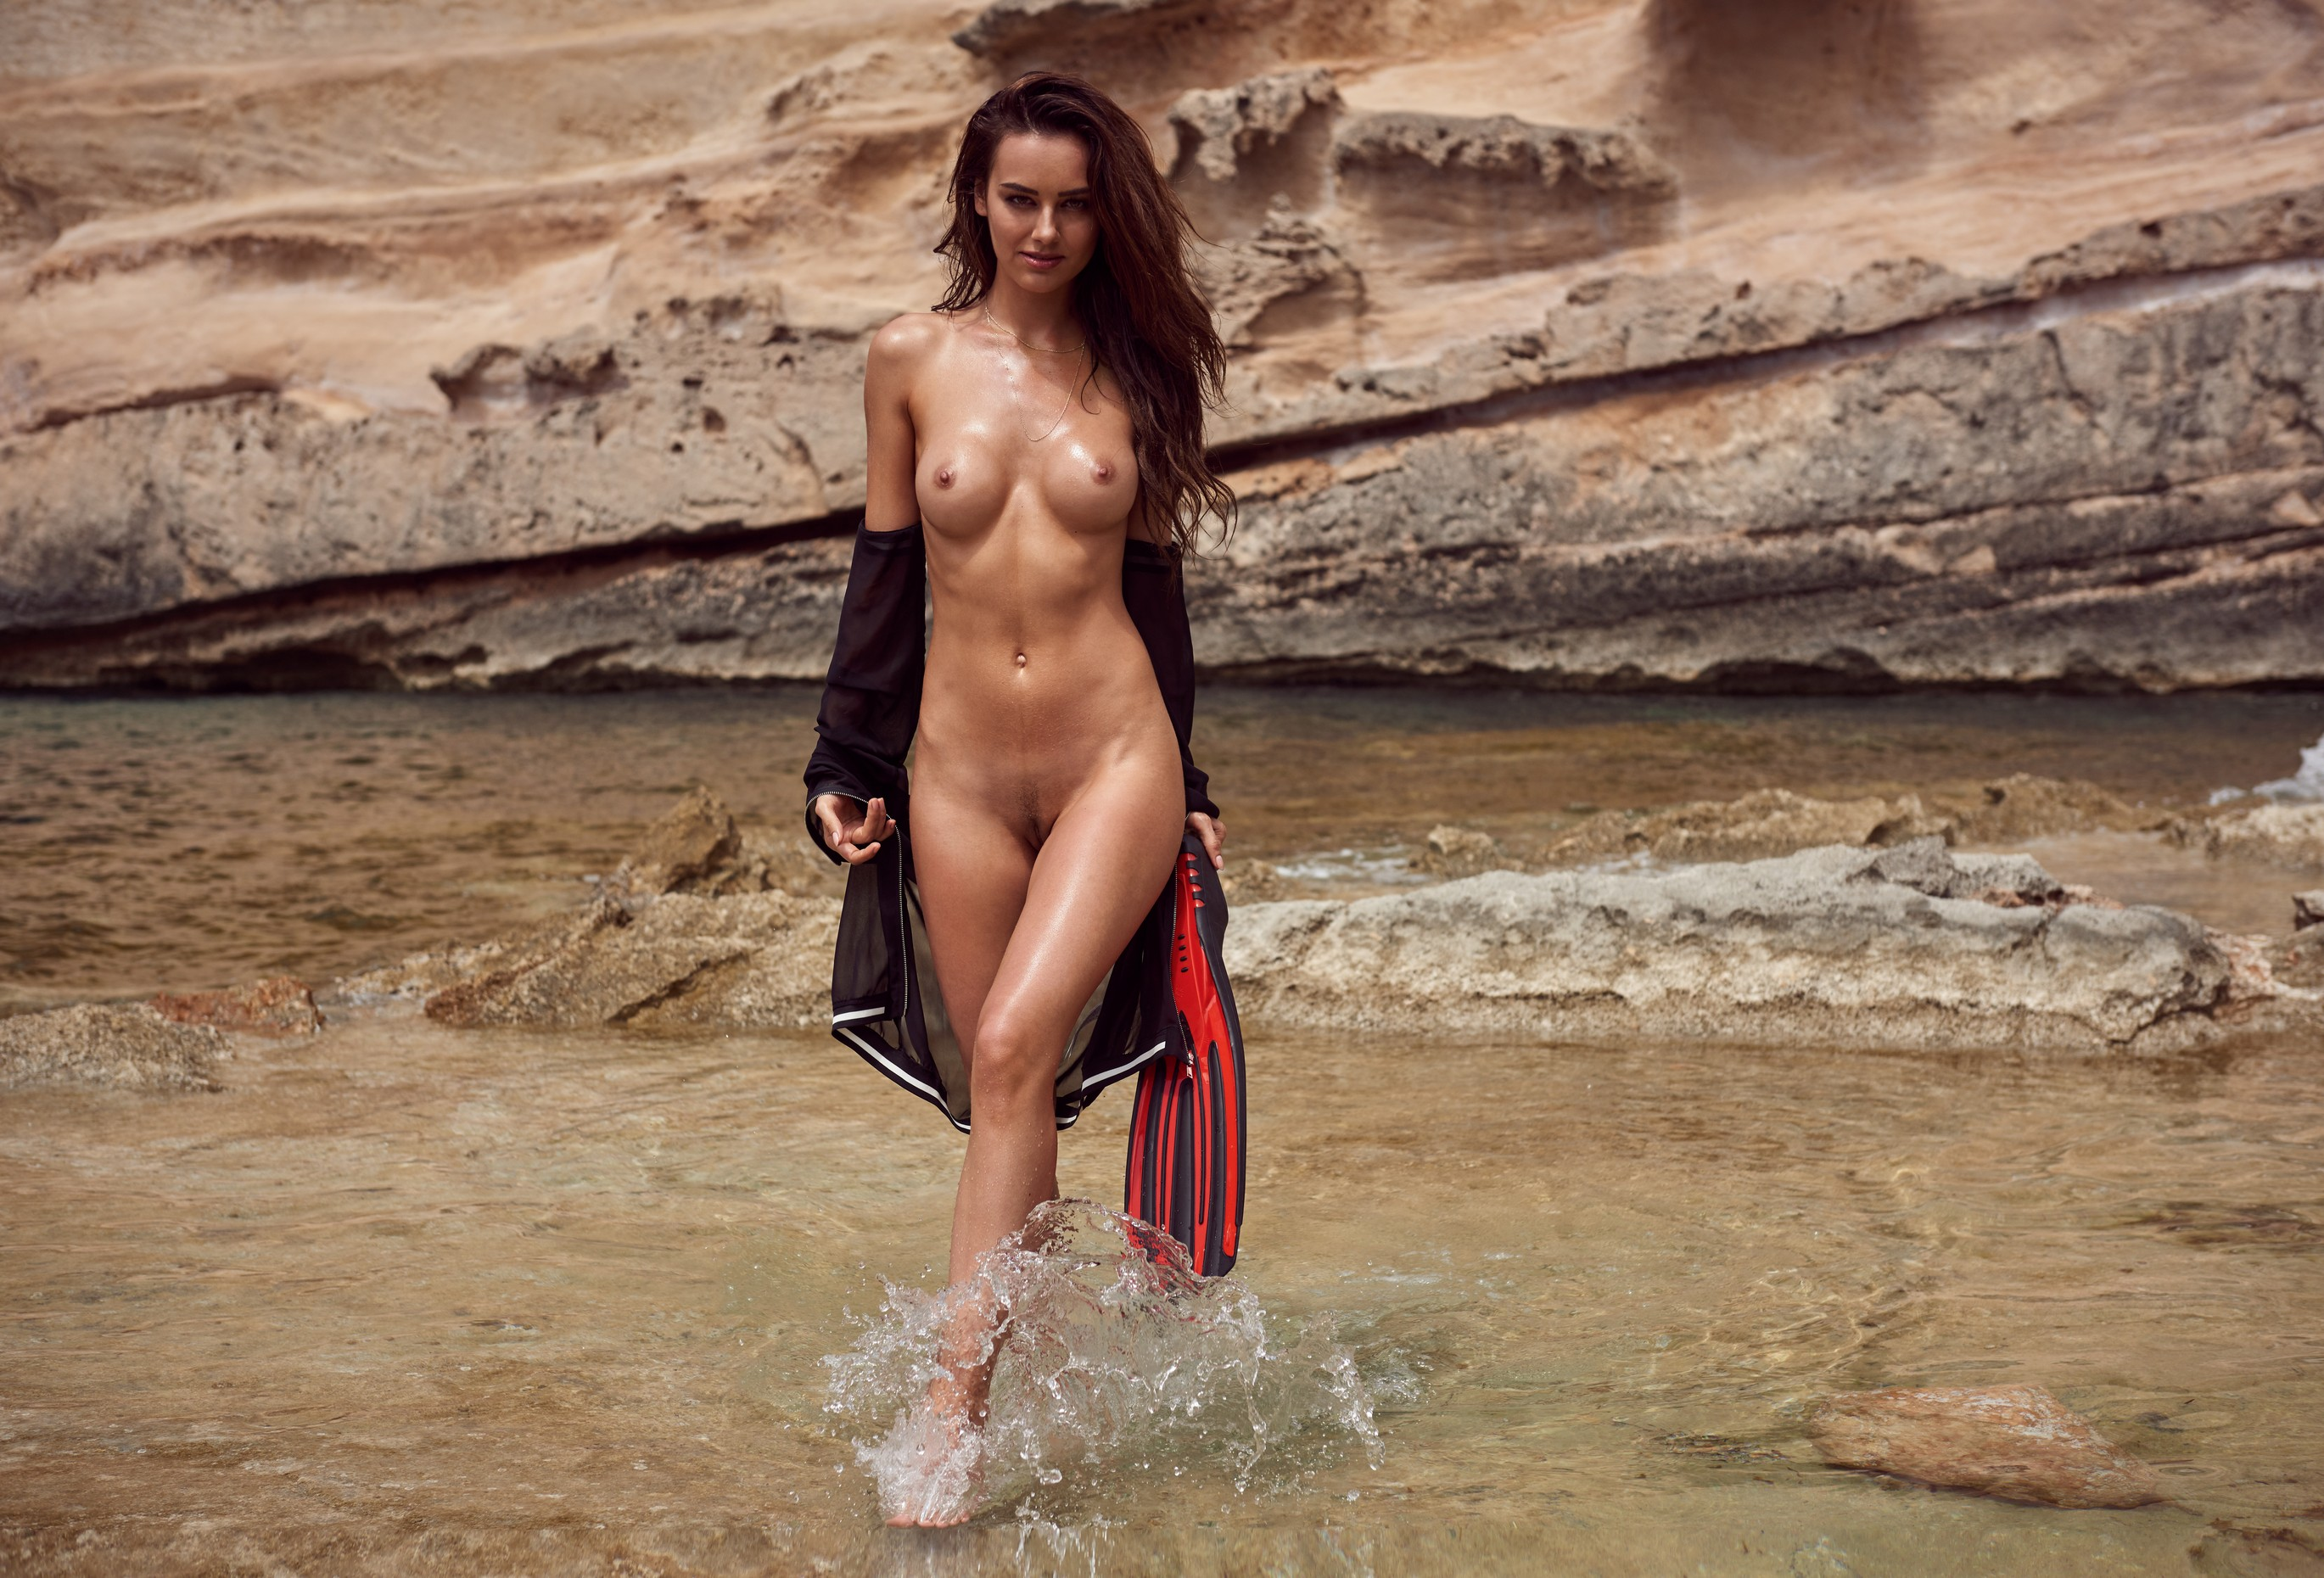 veronika-klimovits-naked-diving-motorboat-seaside-playboy-30